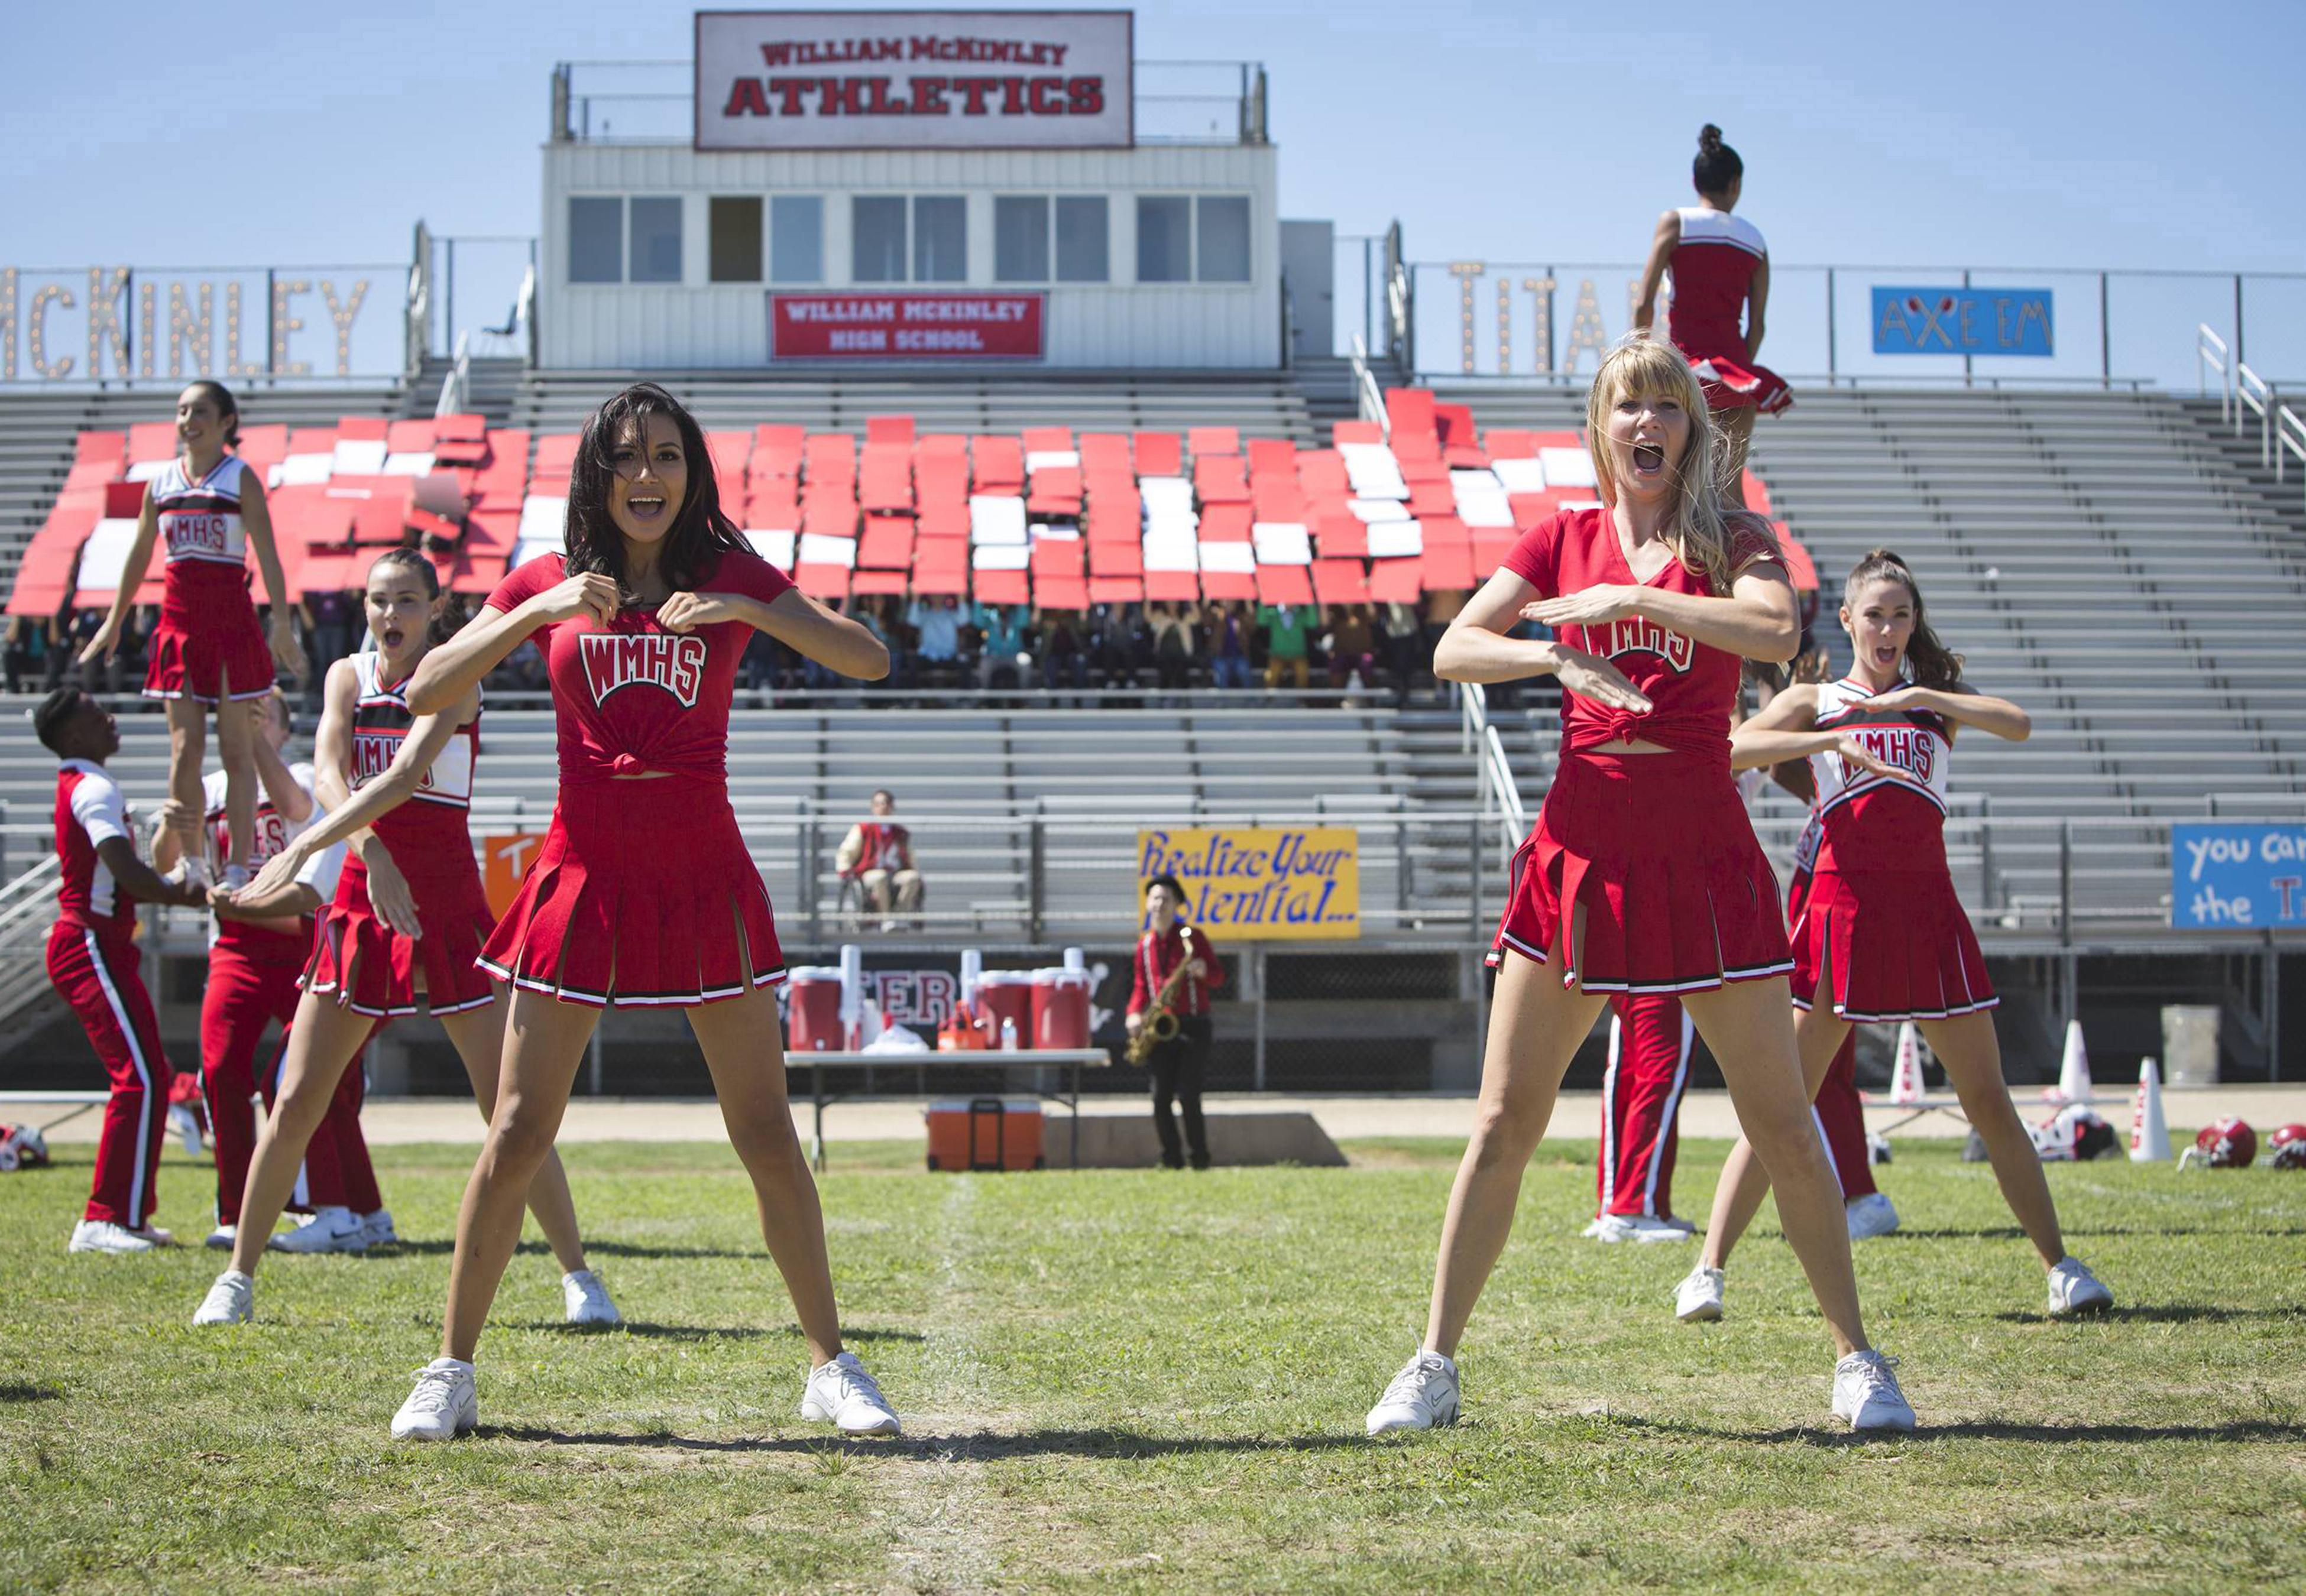 Glee Season 6 Image 1